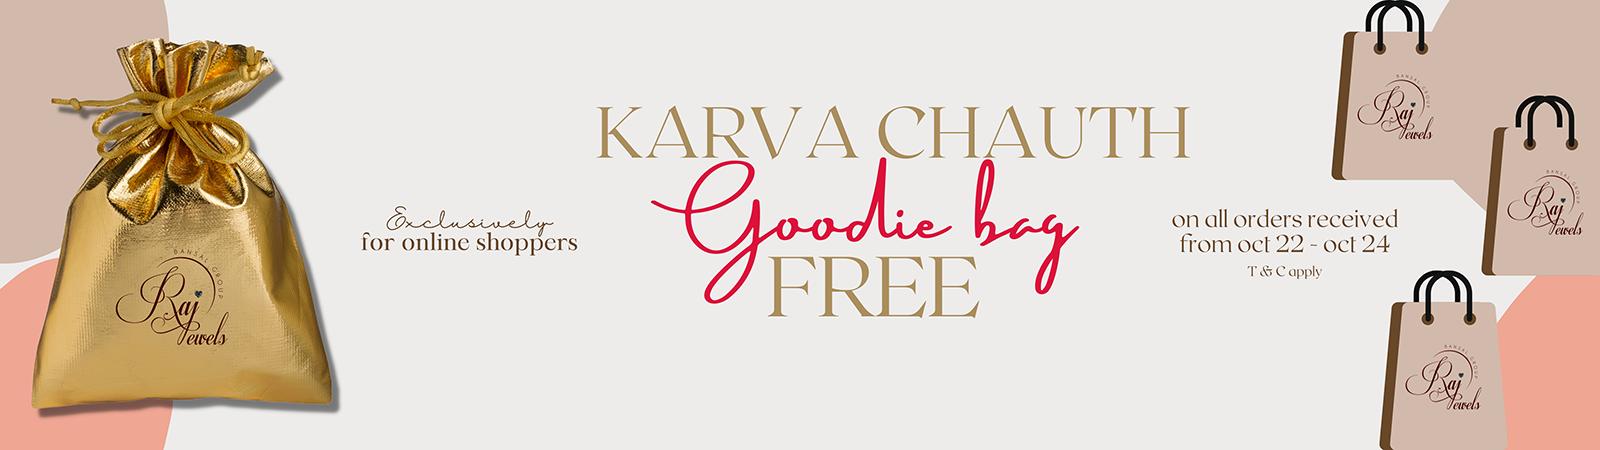 Free goodie bag when you shop online at rajjewels.com